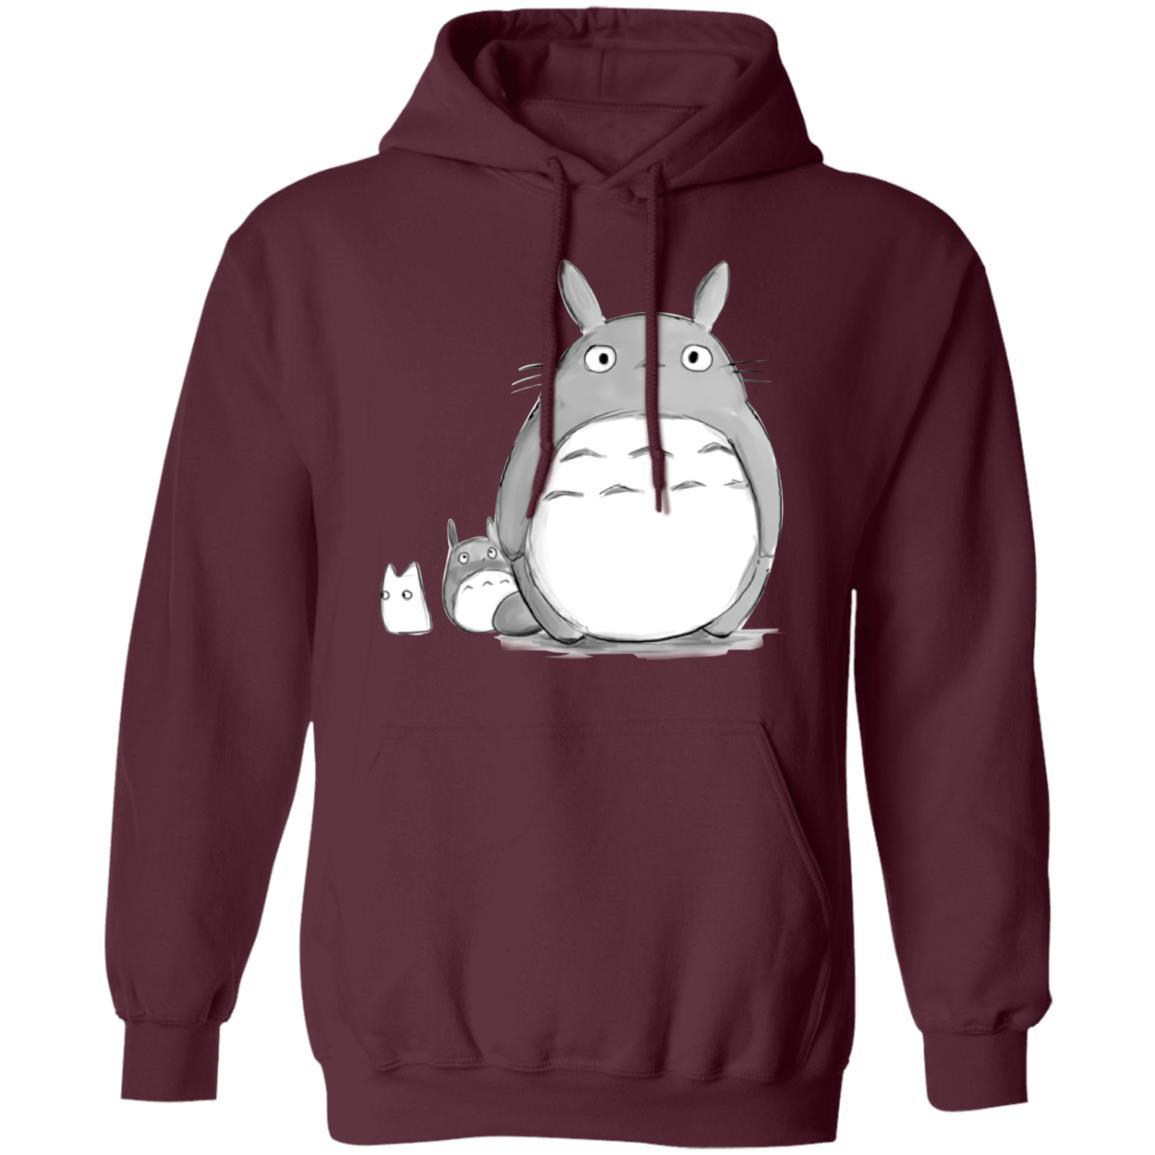 My Neighbor Totoro: The Giant and the Mini Hoodie